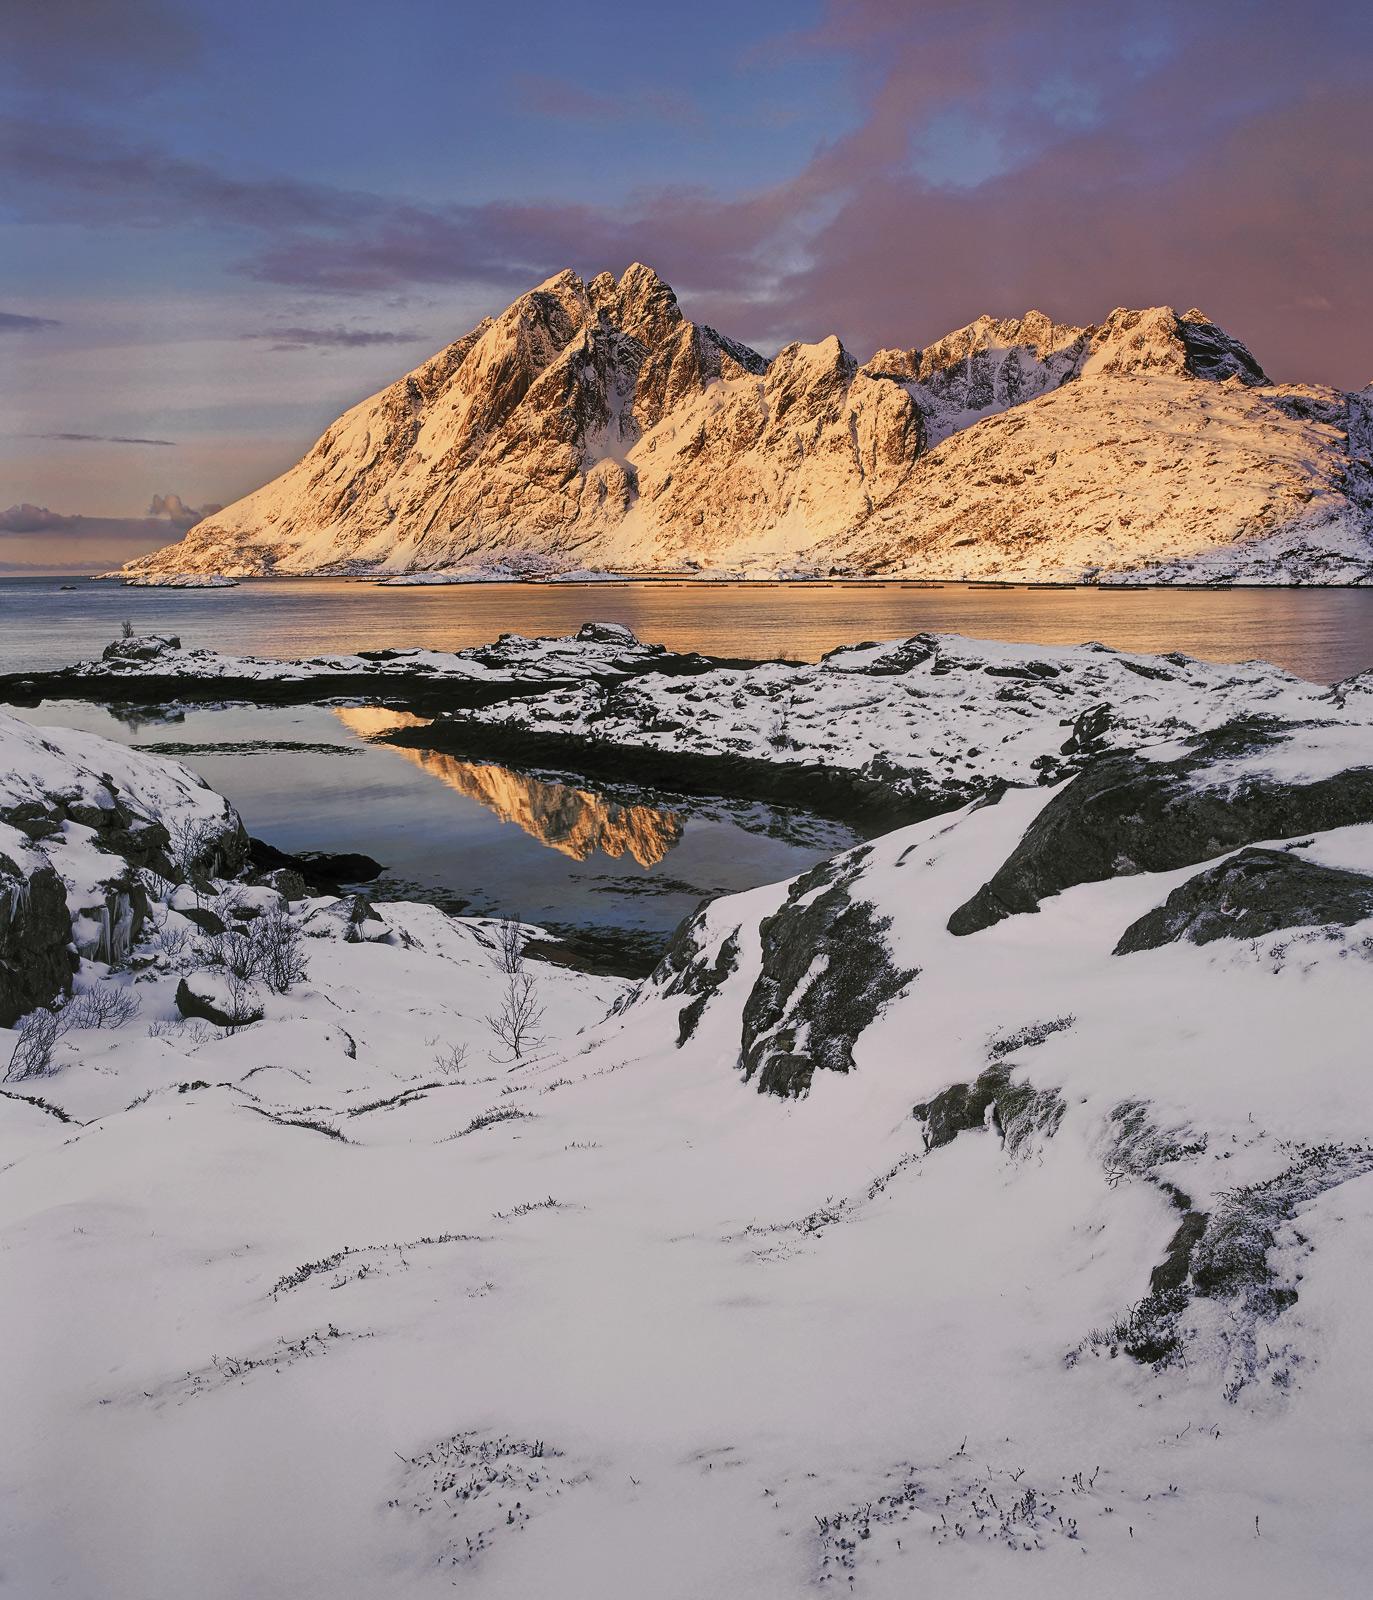 Sund Caramel, Sund, Lofoten, Norway, sunrise, fjord, hamlet, snow, peaks, caramel, invrted, reflected, mountain, texture, photo